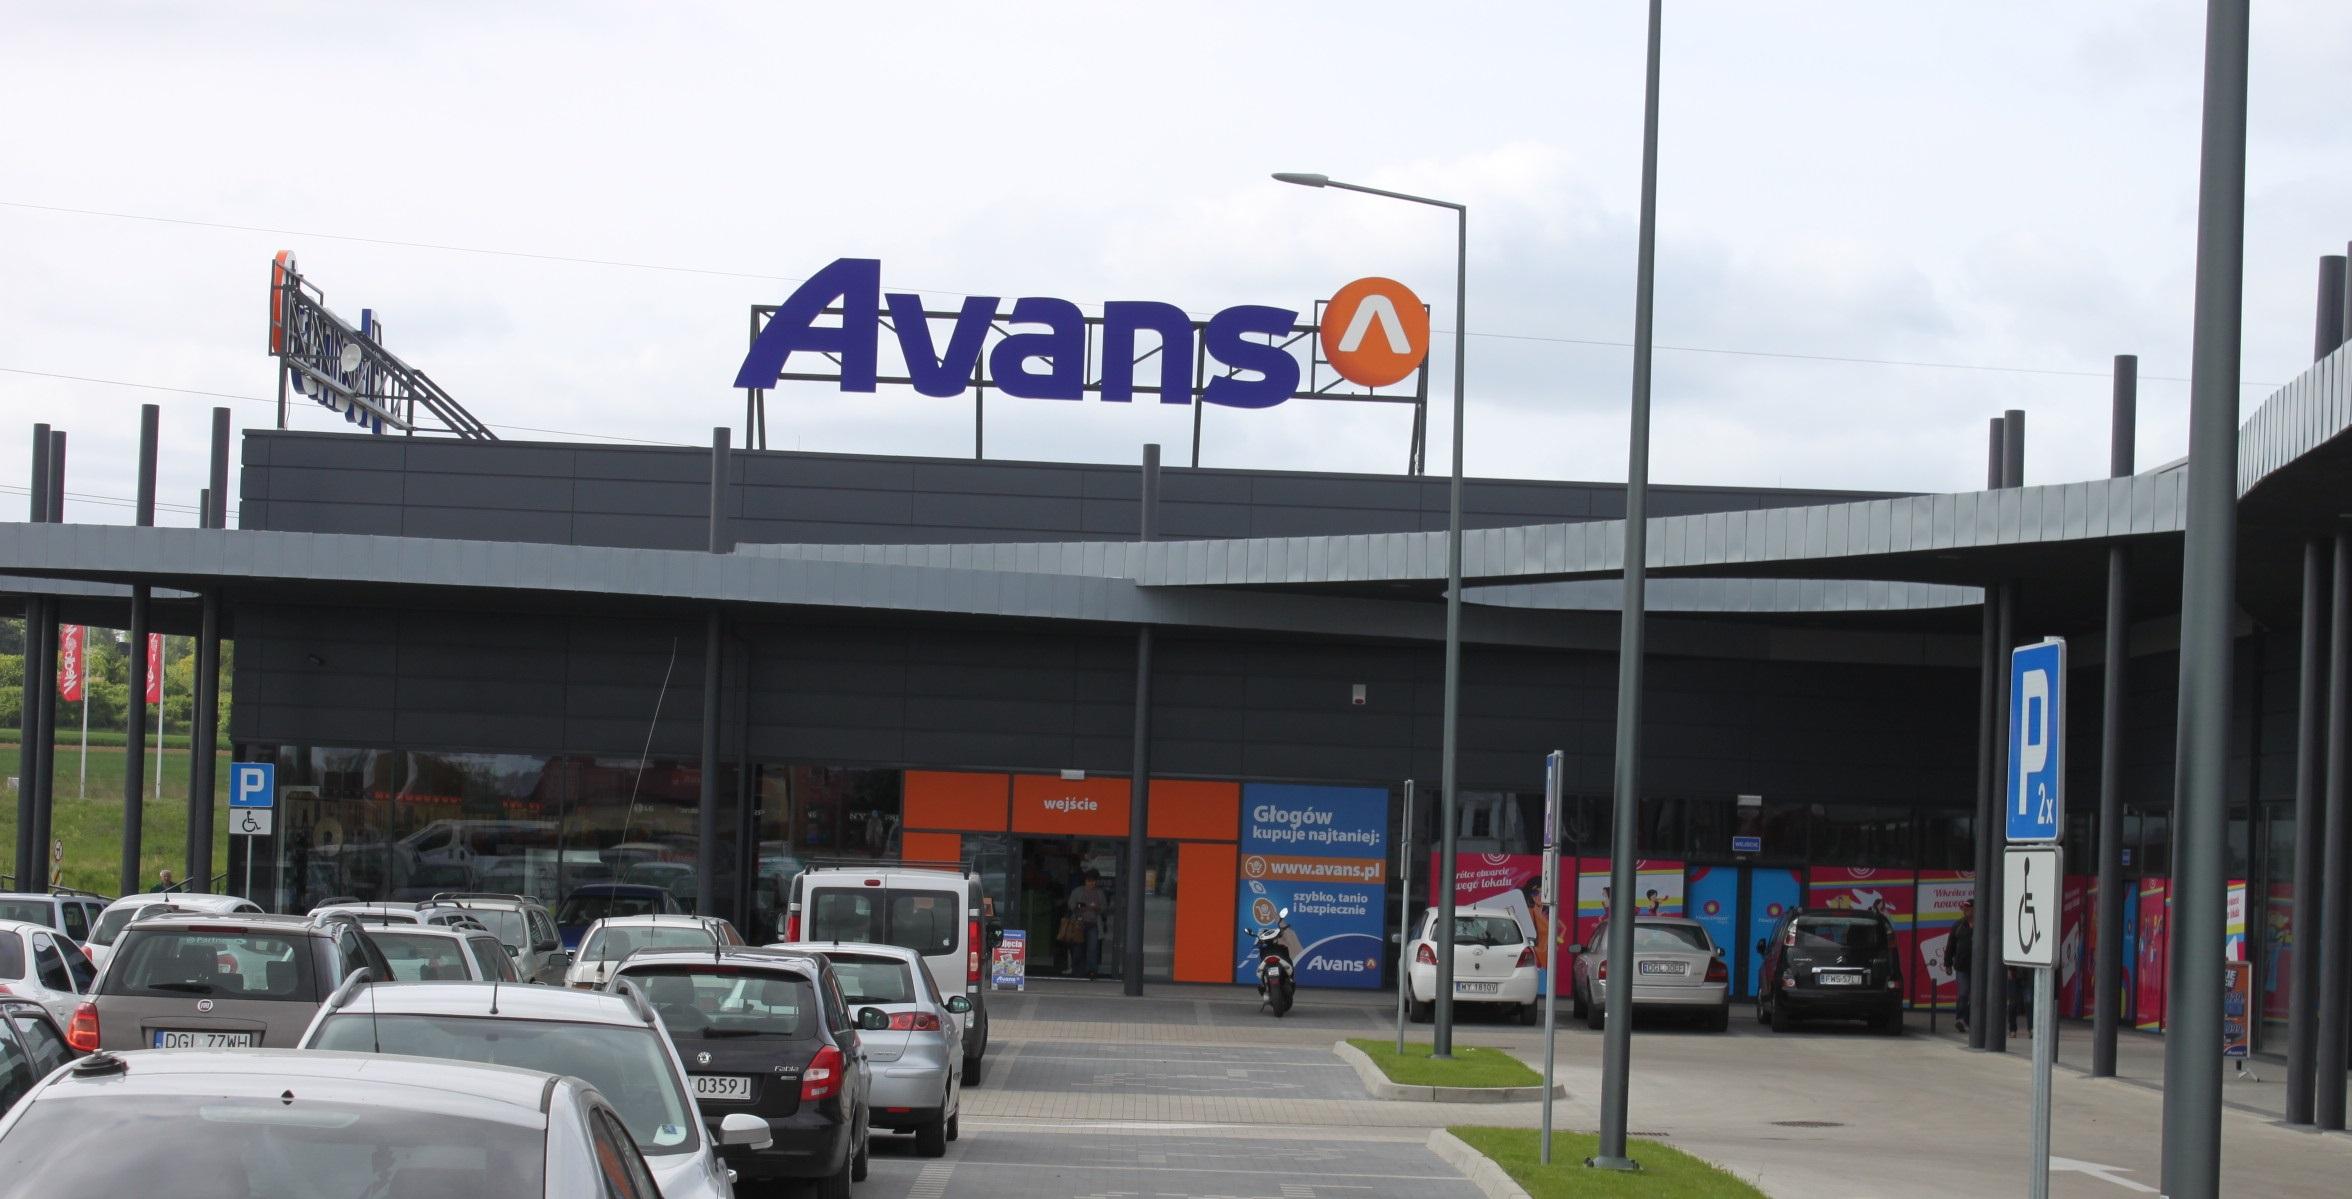 Avans: 30 nowych marketów